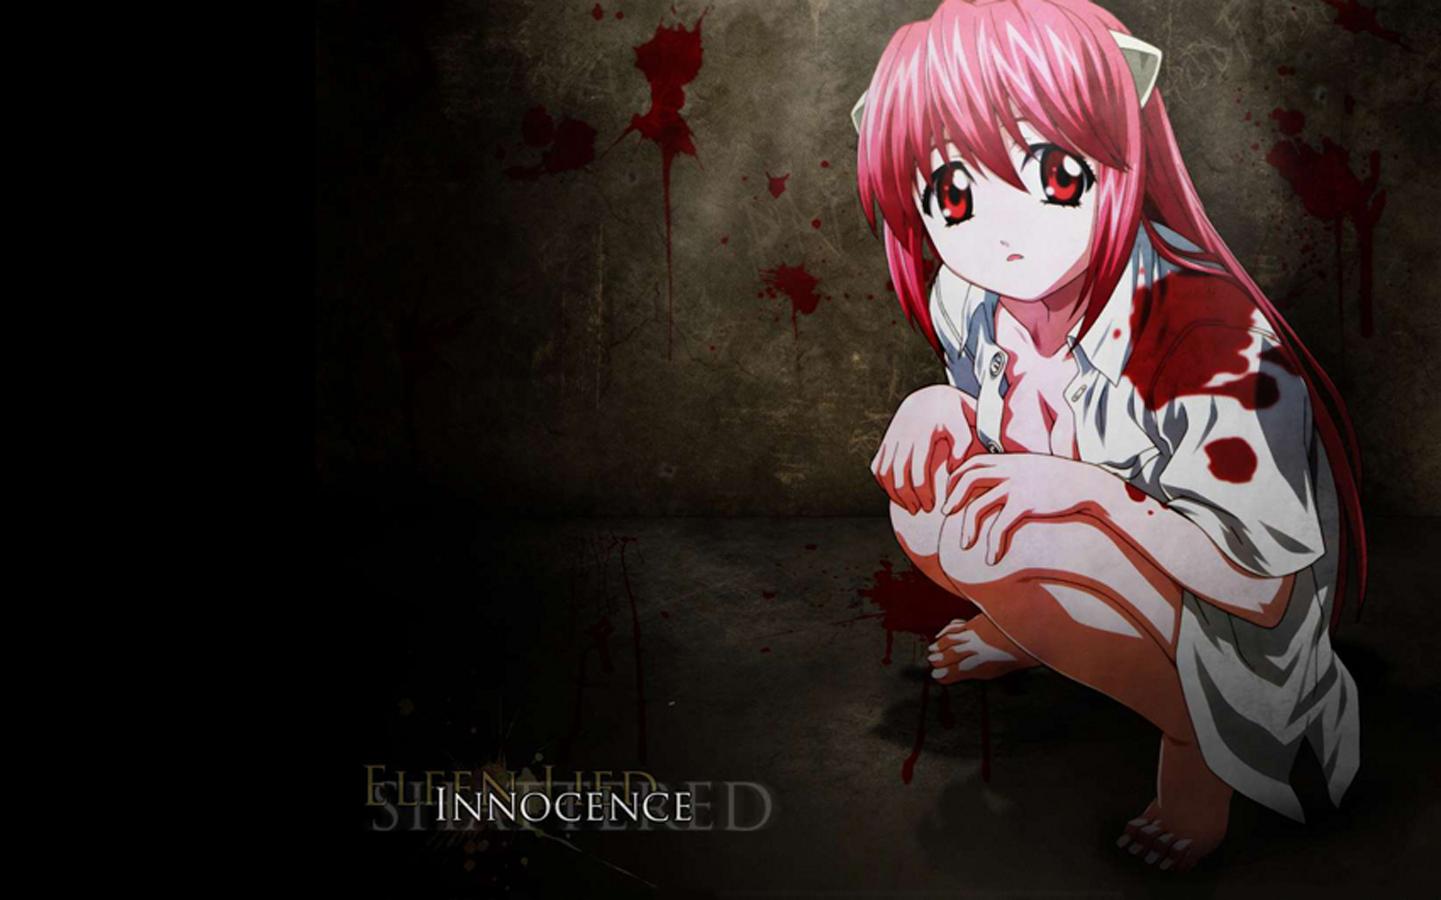 Elfen Lied Lucy Innocence Anime Anime Girls Pink Hair Long Hair Bangs Red Eyes White Shirt Horns Art 1441x900